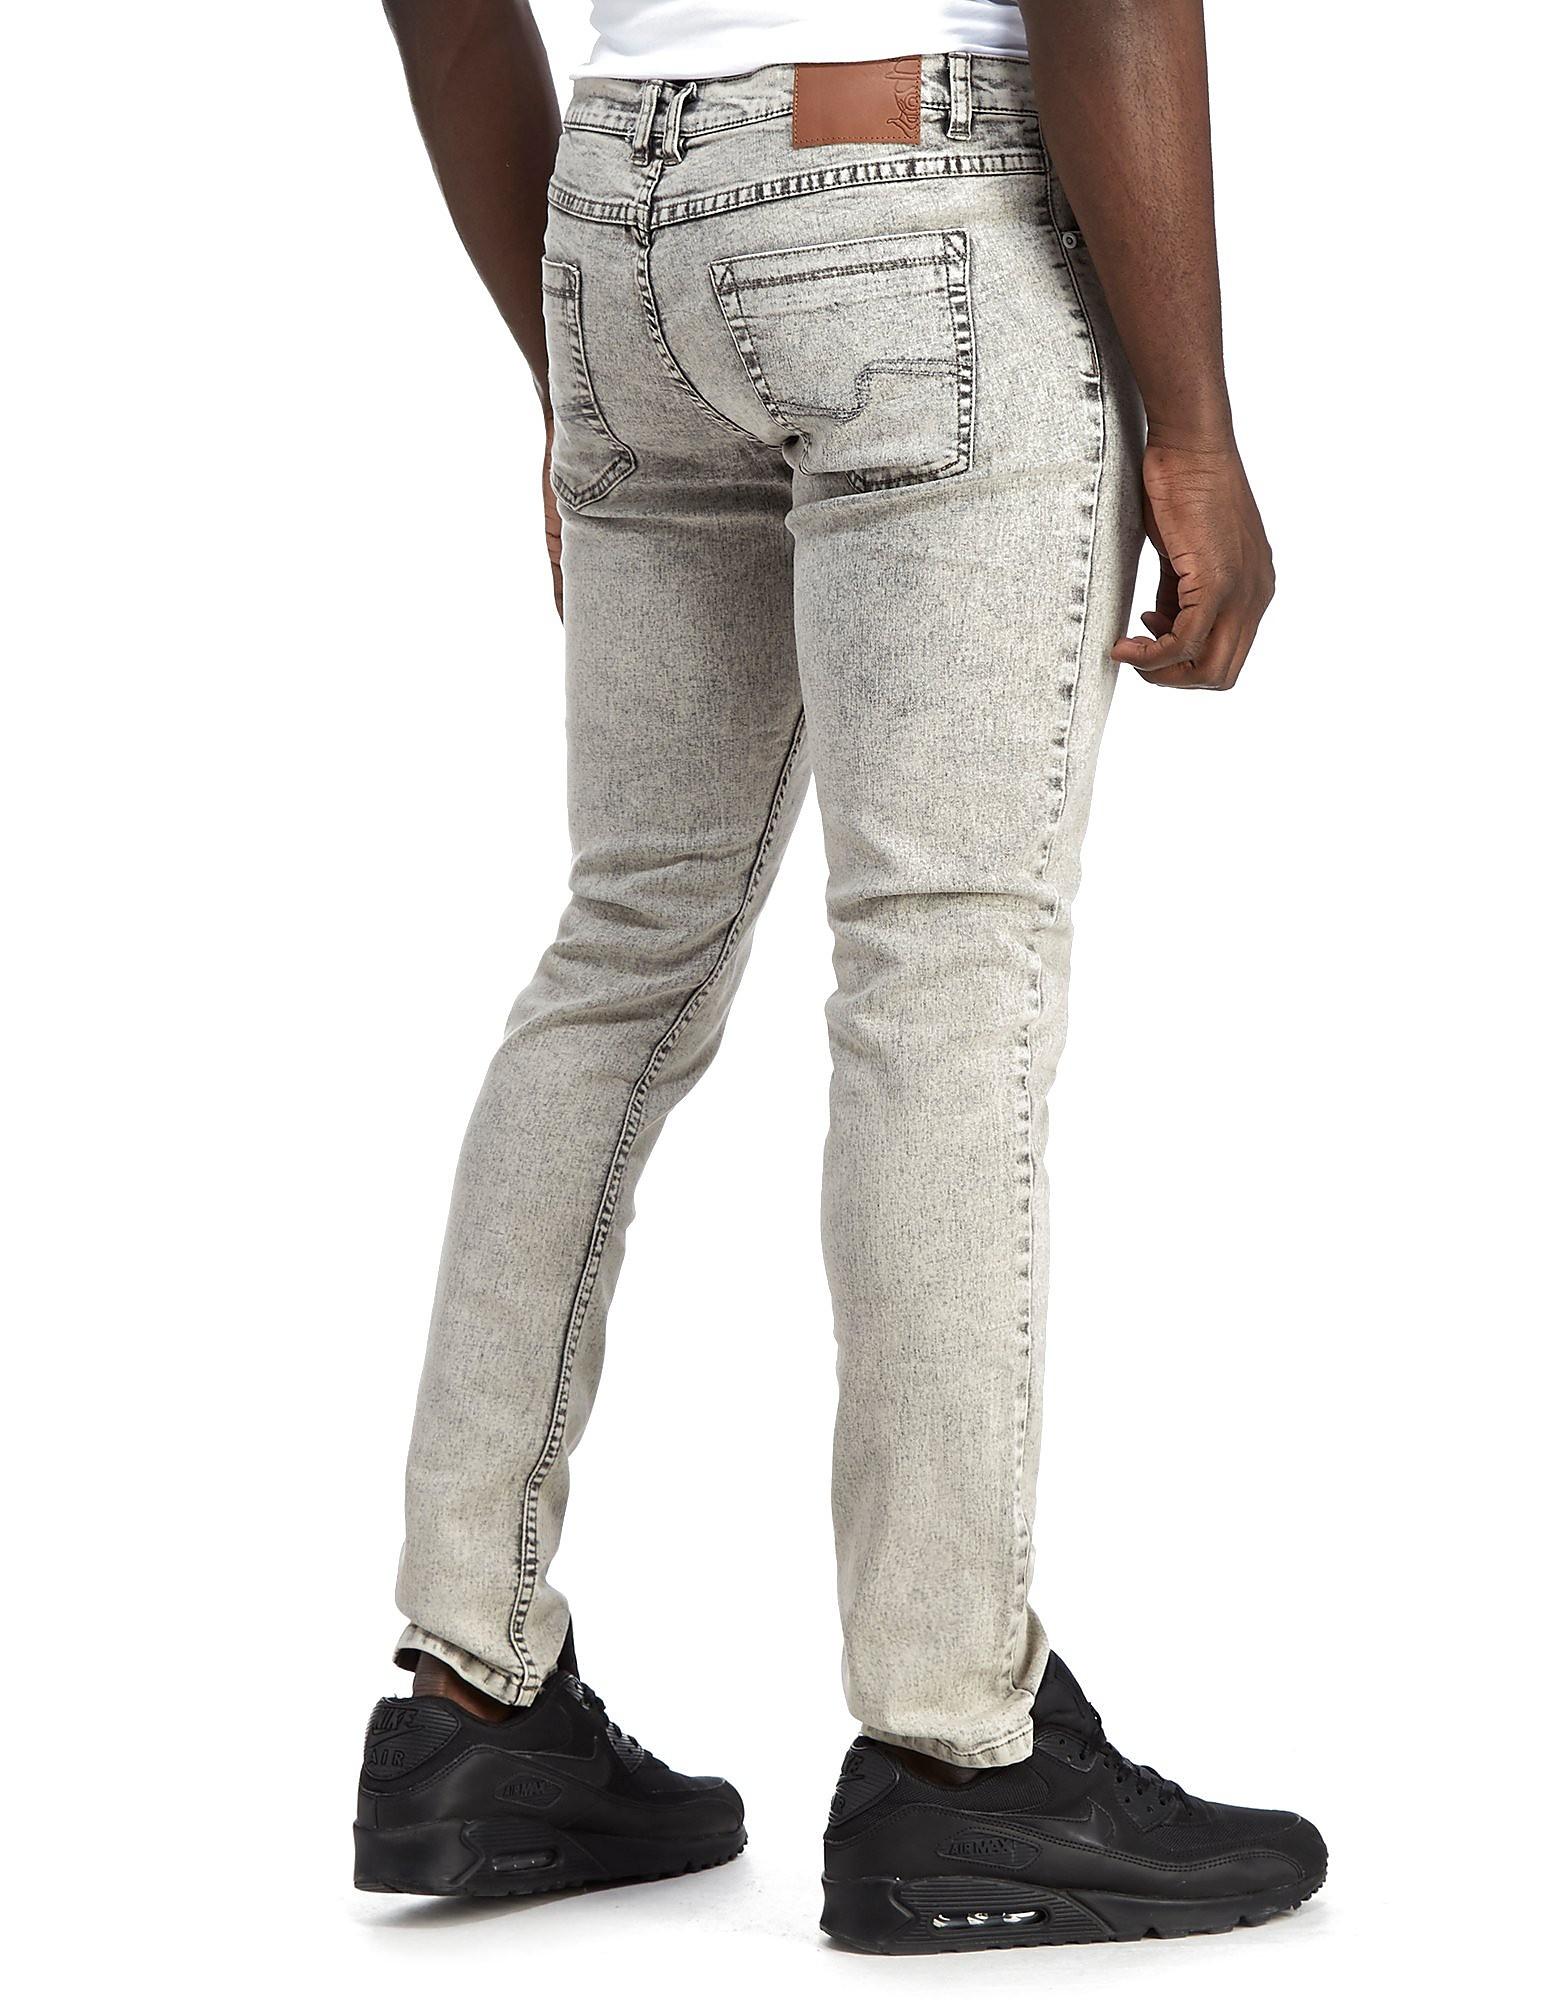 Nanny State Pinner Skinny Jeans